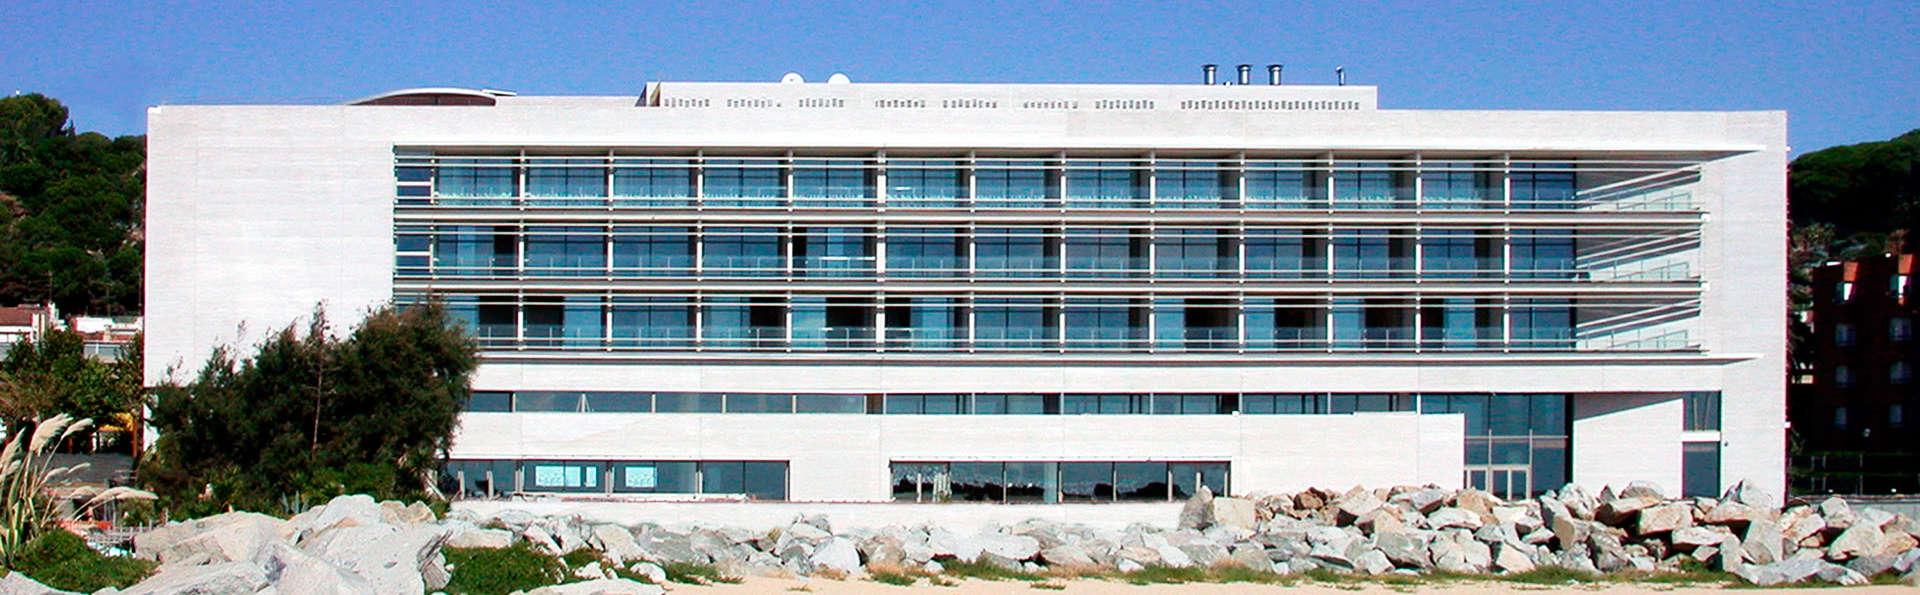 Hotel Colón Thalasso Termal - edit_front1.jpg